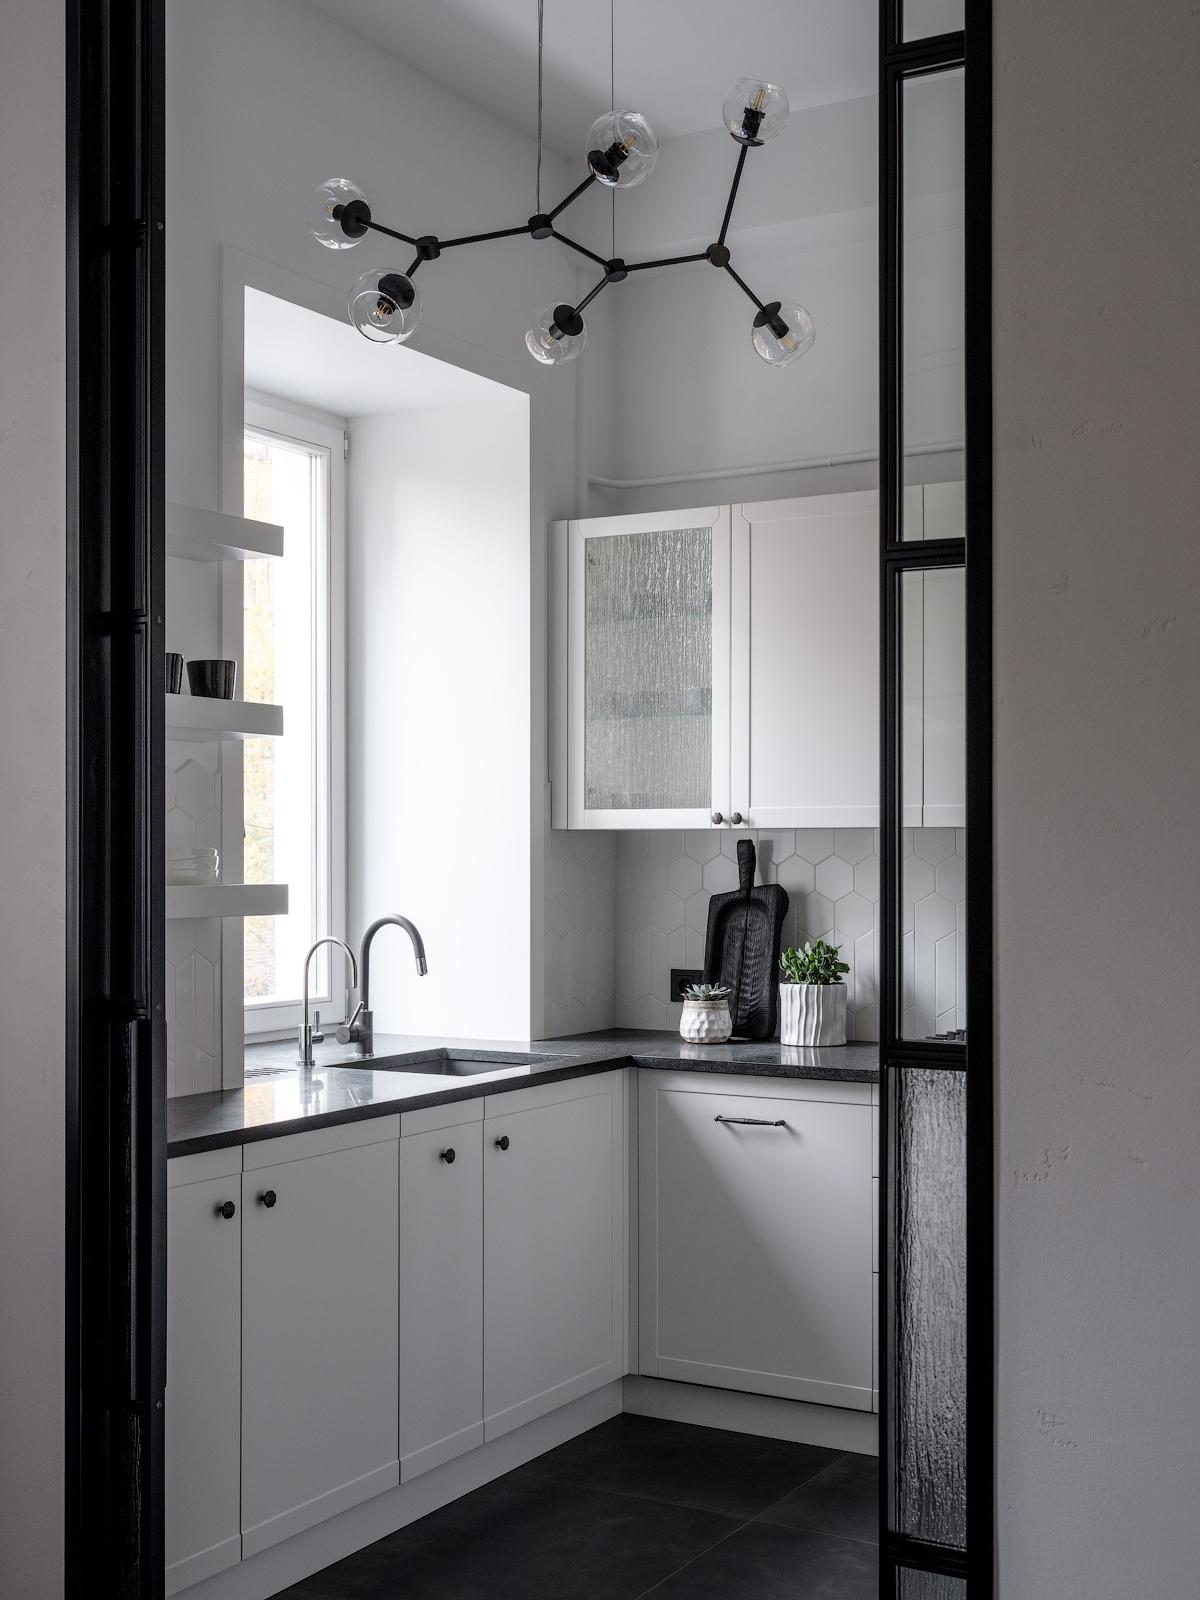 adelaparvu.com despre apartament 90 mp, design Minina Design, Foto Mikhail Loskutov (13)